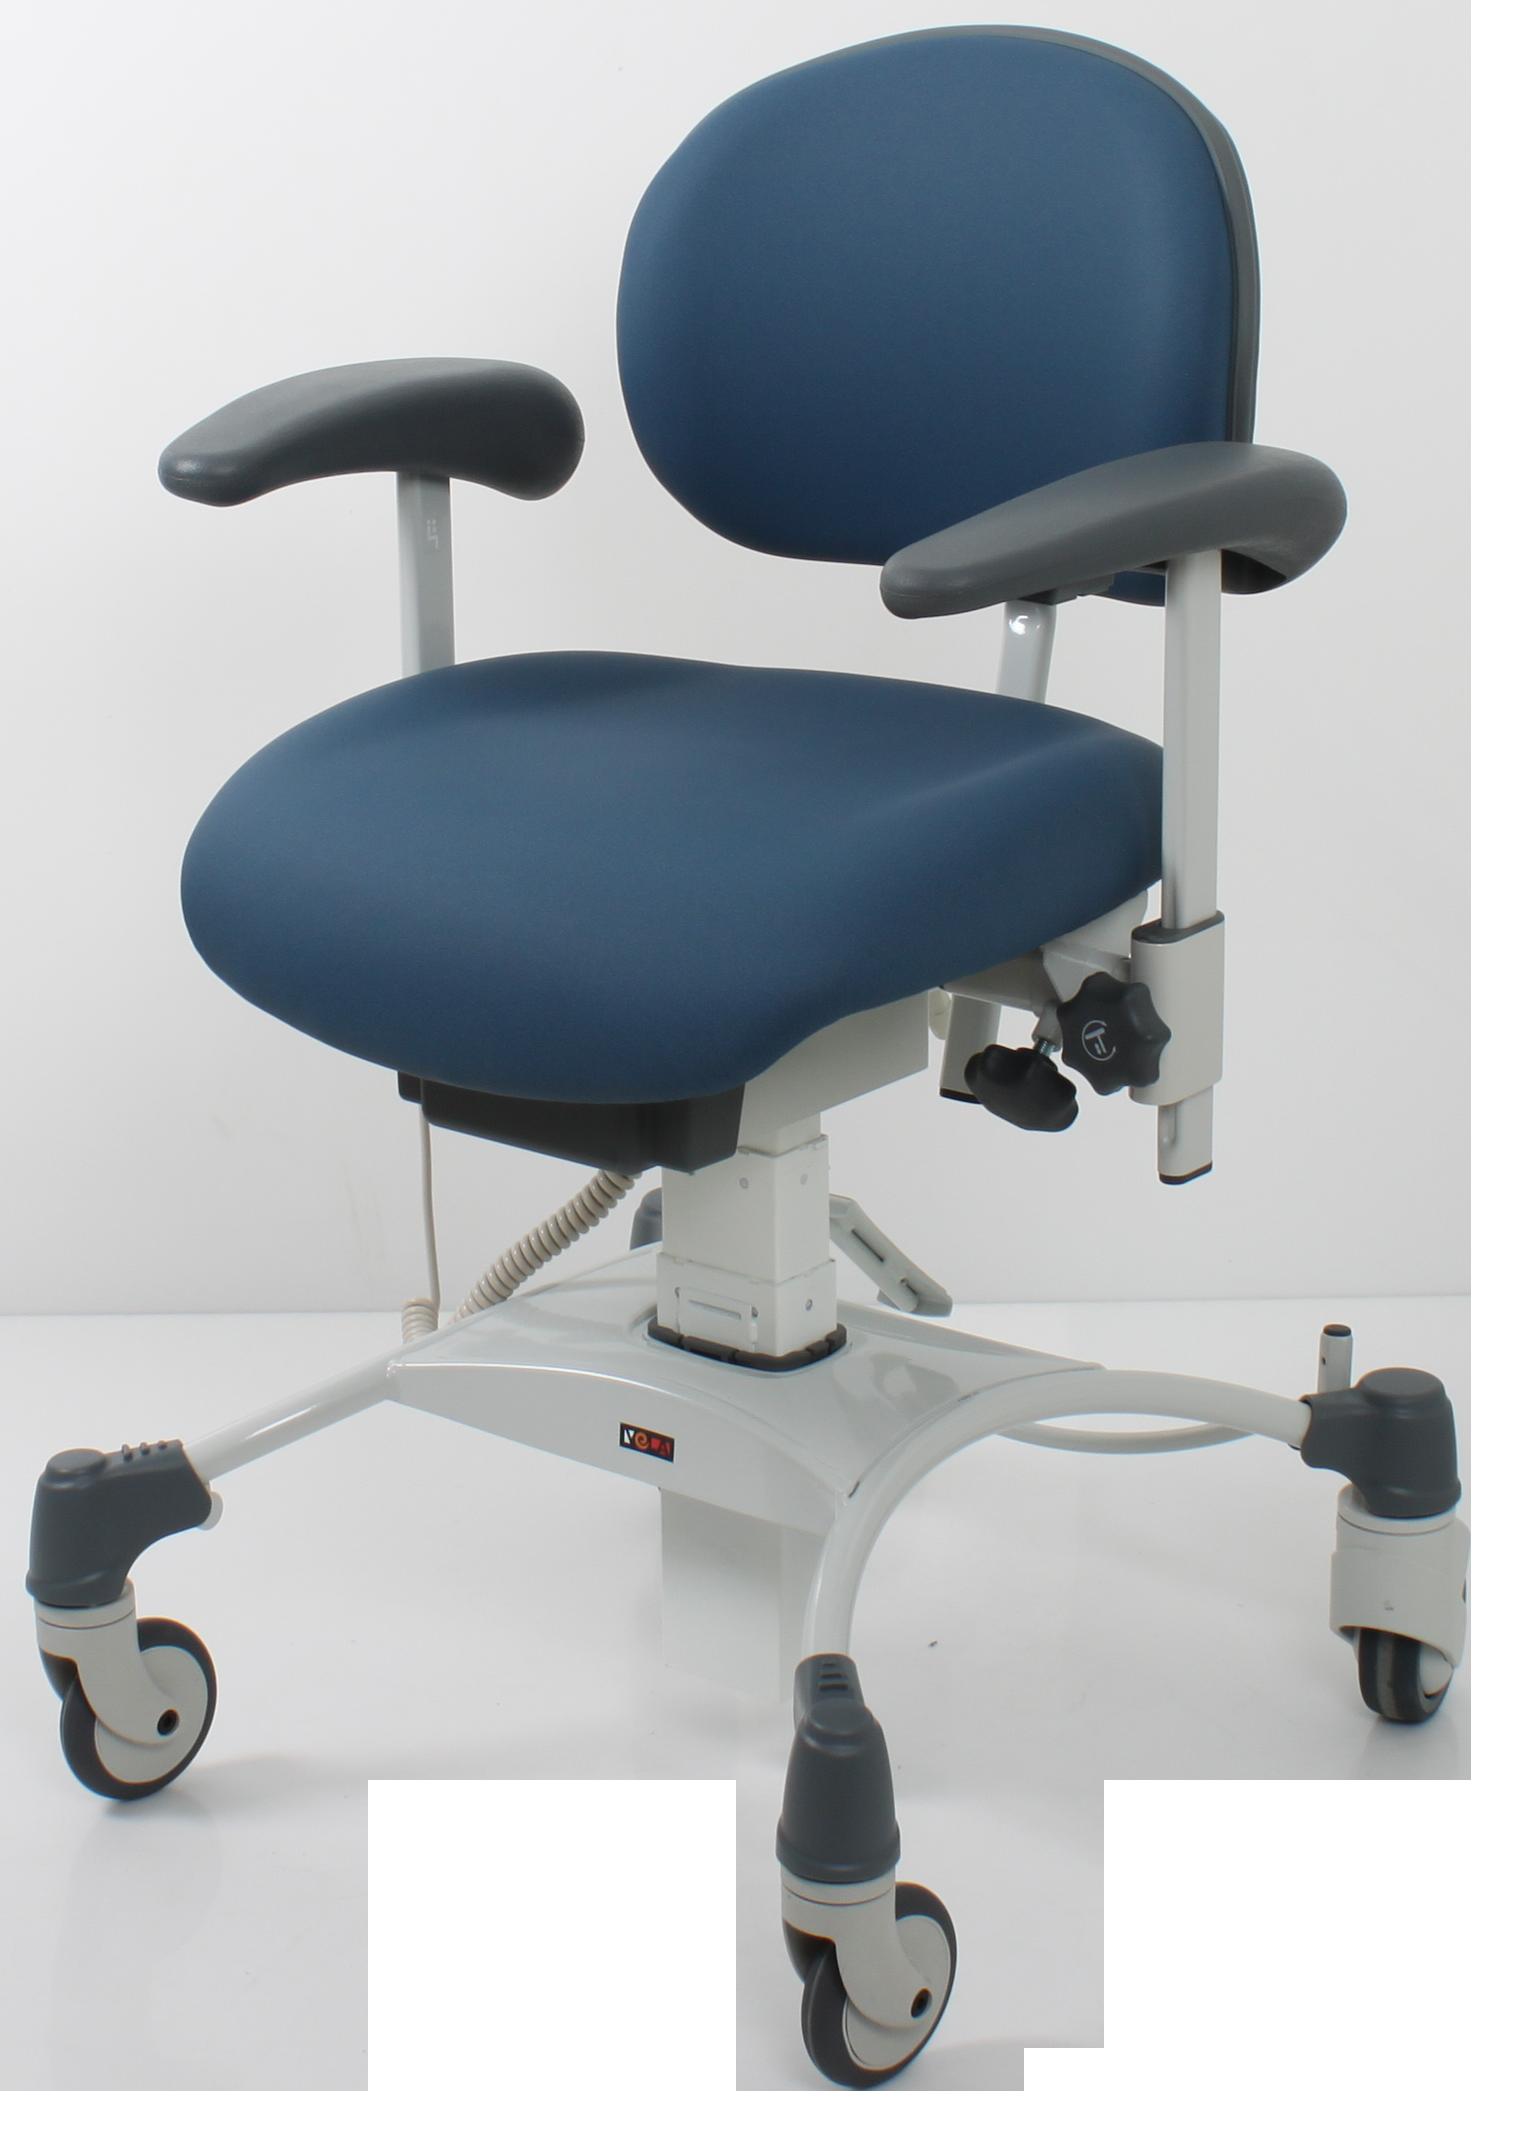 https://www.lameris-group.nl/wp-content/uploads/2020/03/VELA-Basic-Ophtalmology-chair-left.png